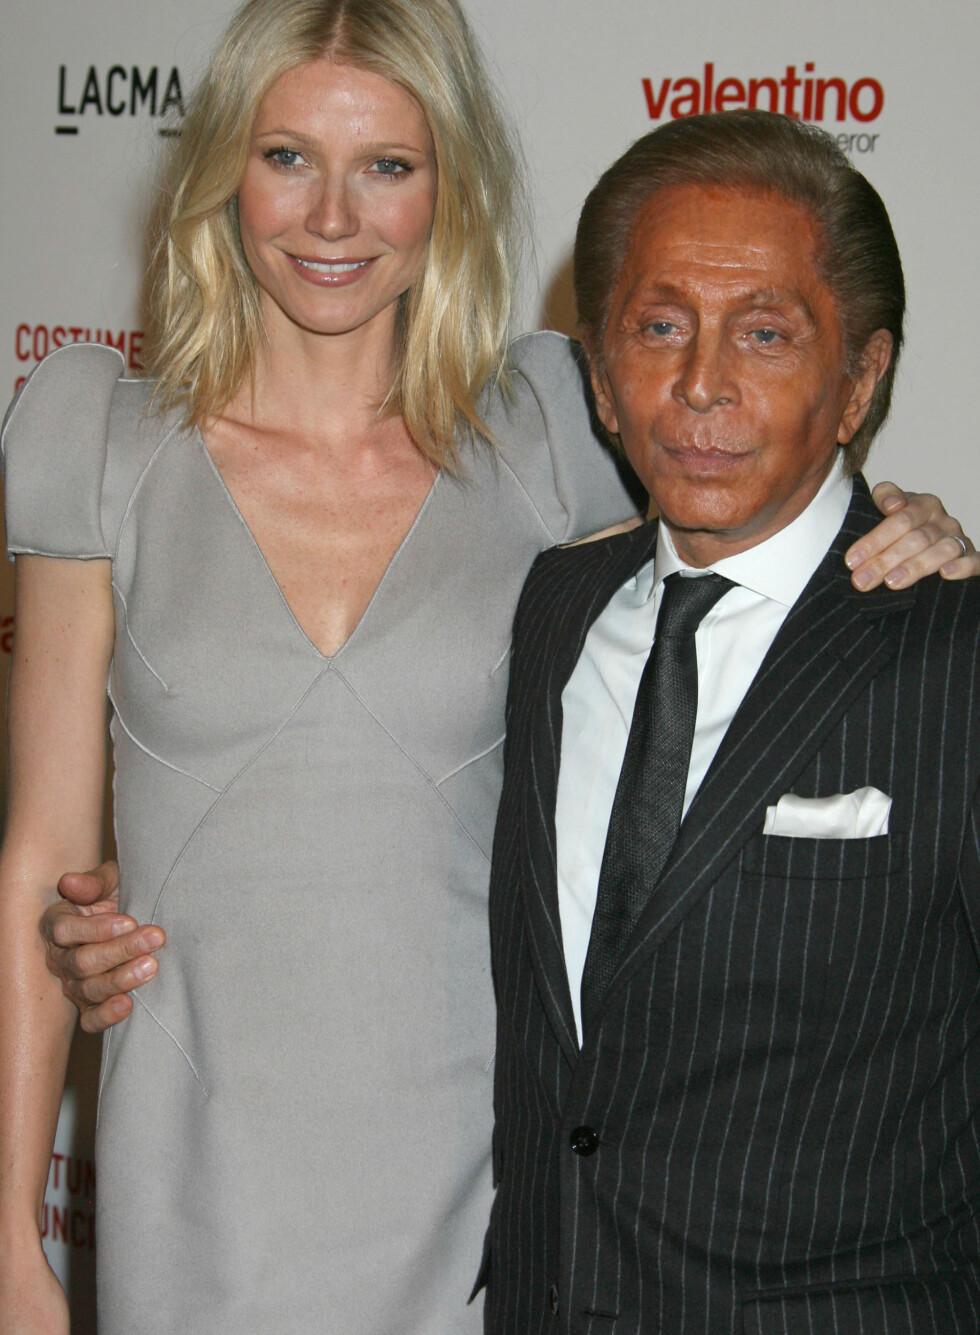 Gwyneth Paltrows naturlige teint understreker Valentinos karnevalssminke. Foto: All Over Press